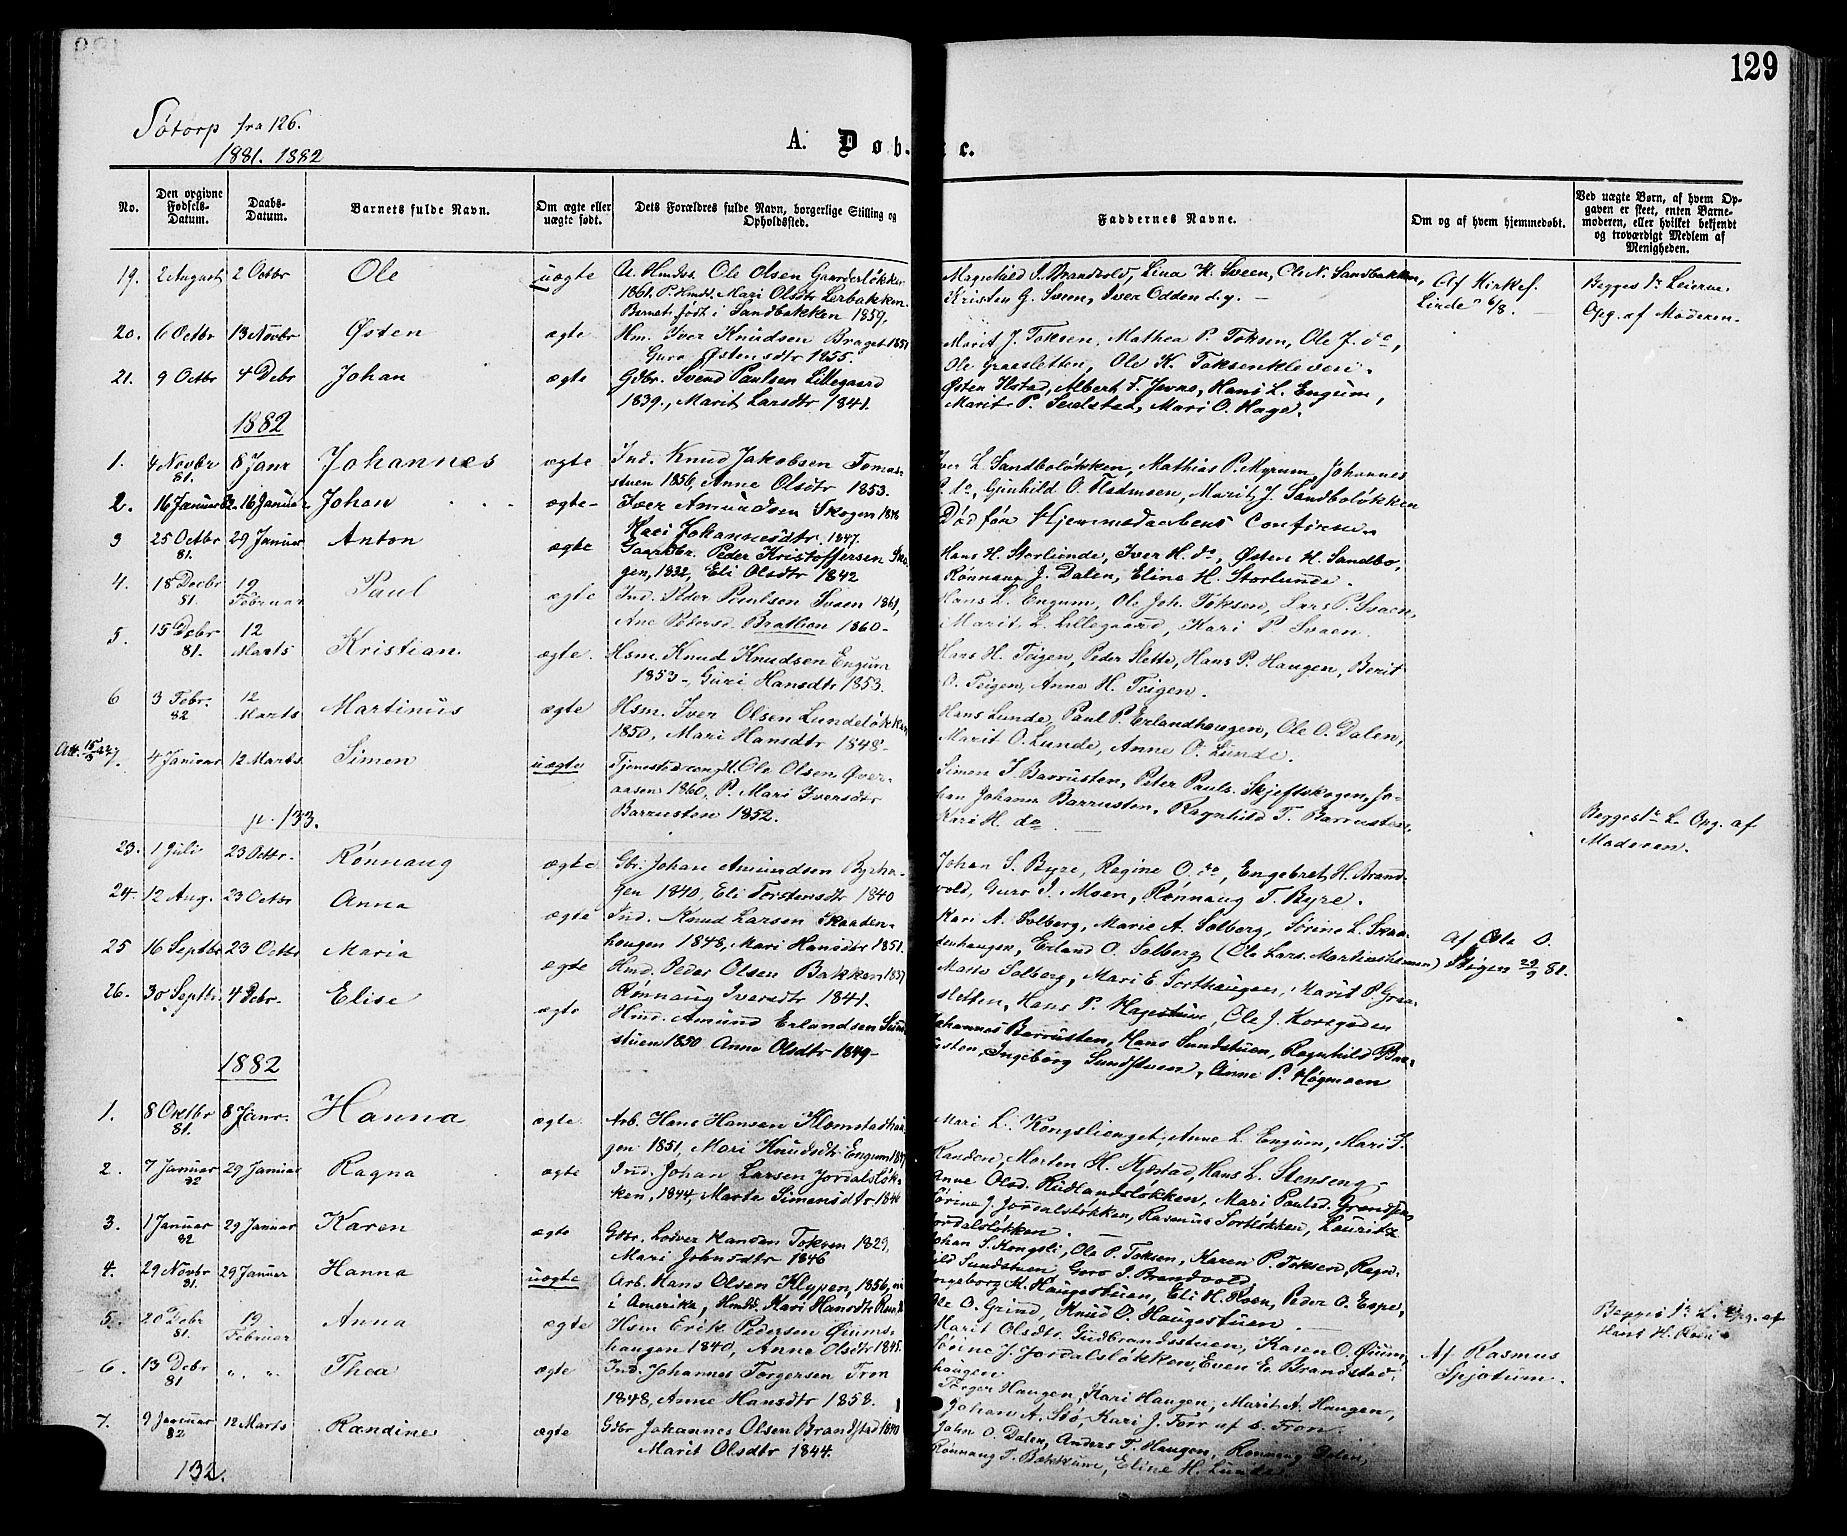 SAH, Nord-Fron prestekontor, Ministerialbok nr. 2, 1865-1883, s. 129